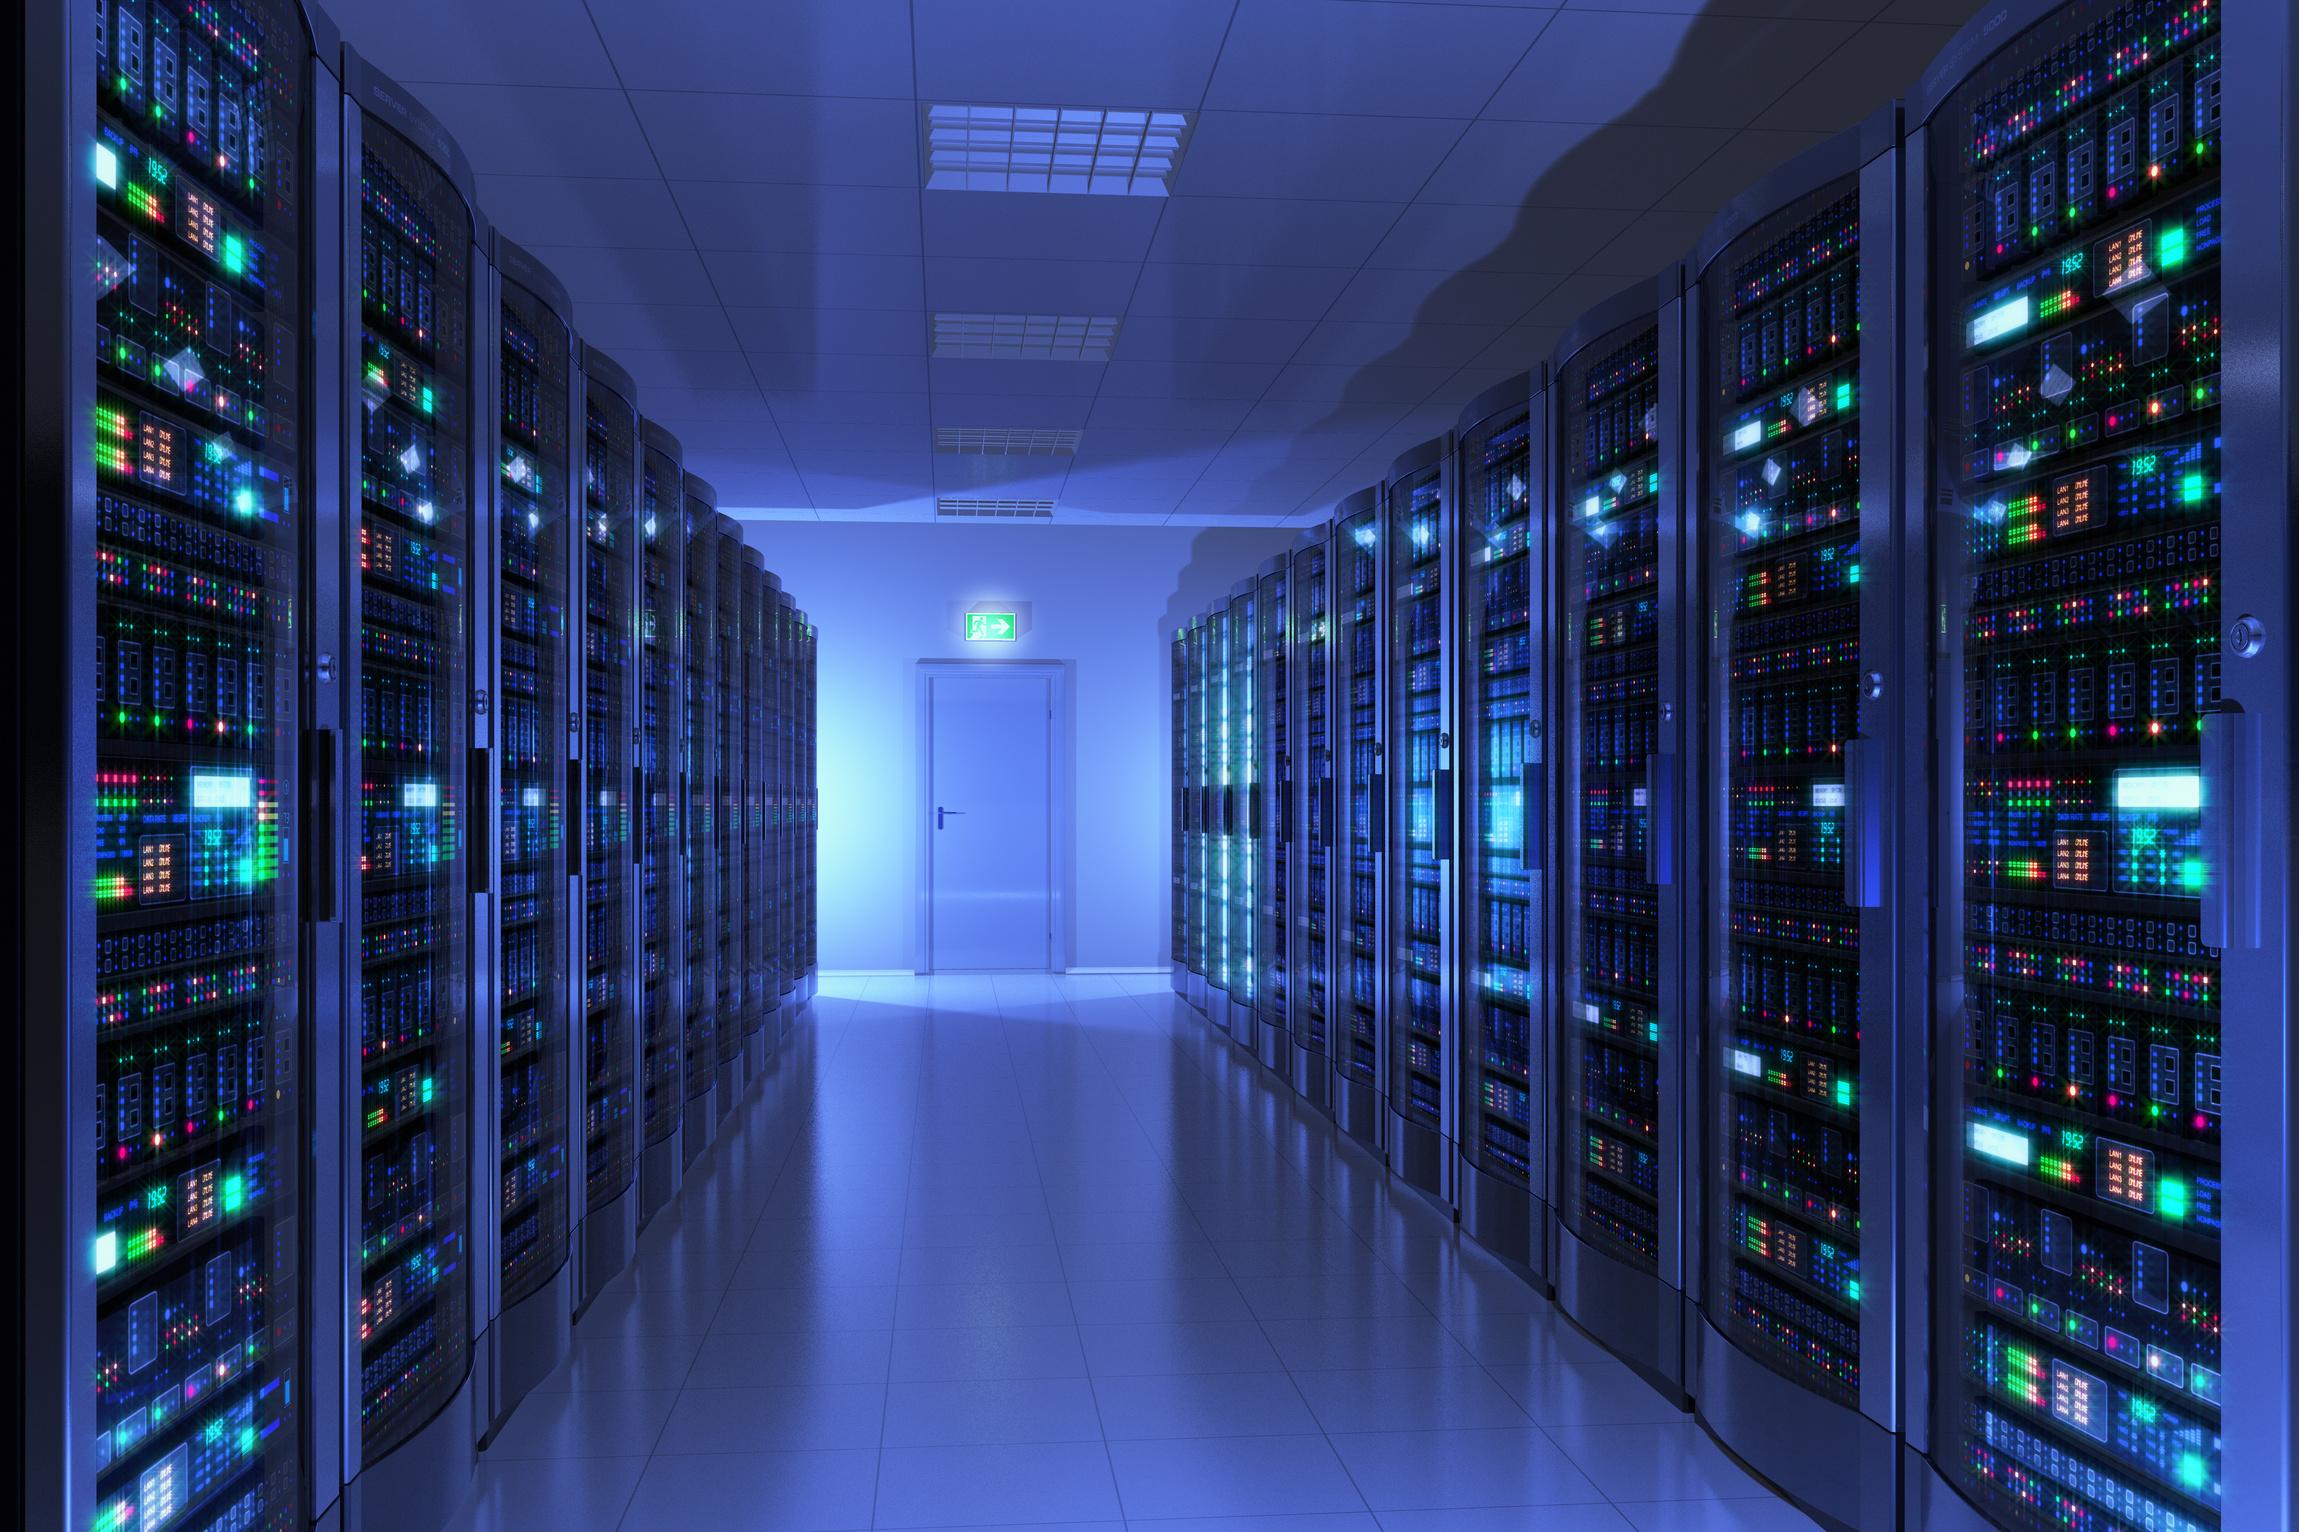 dns isn't resolving xbox server names